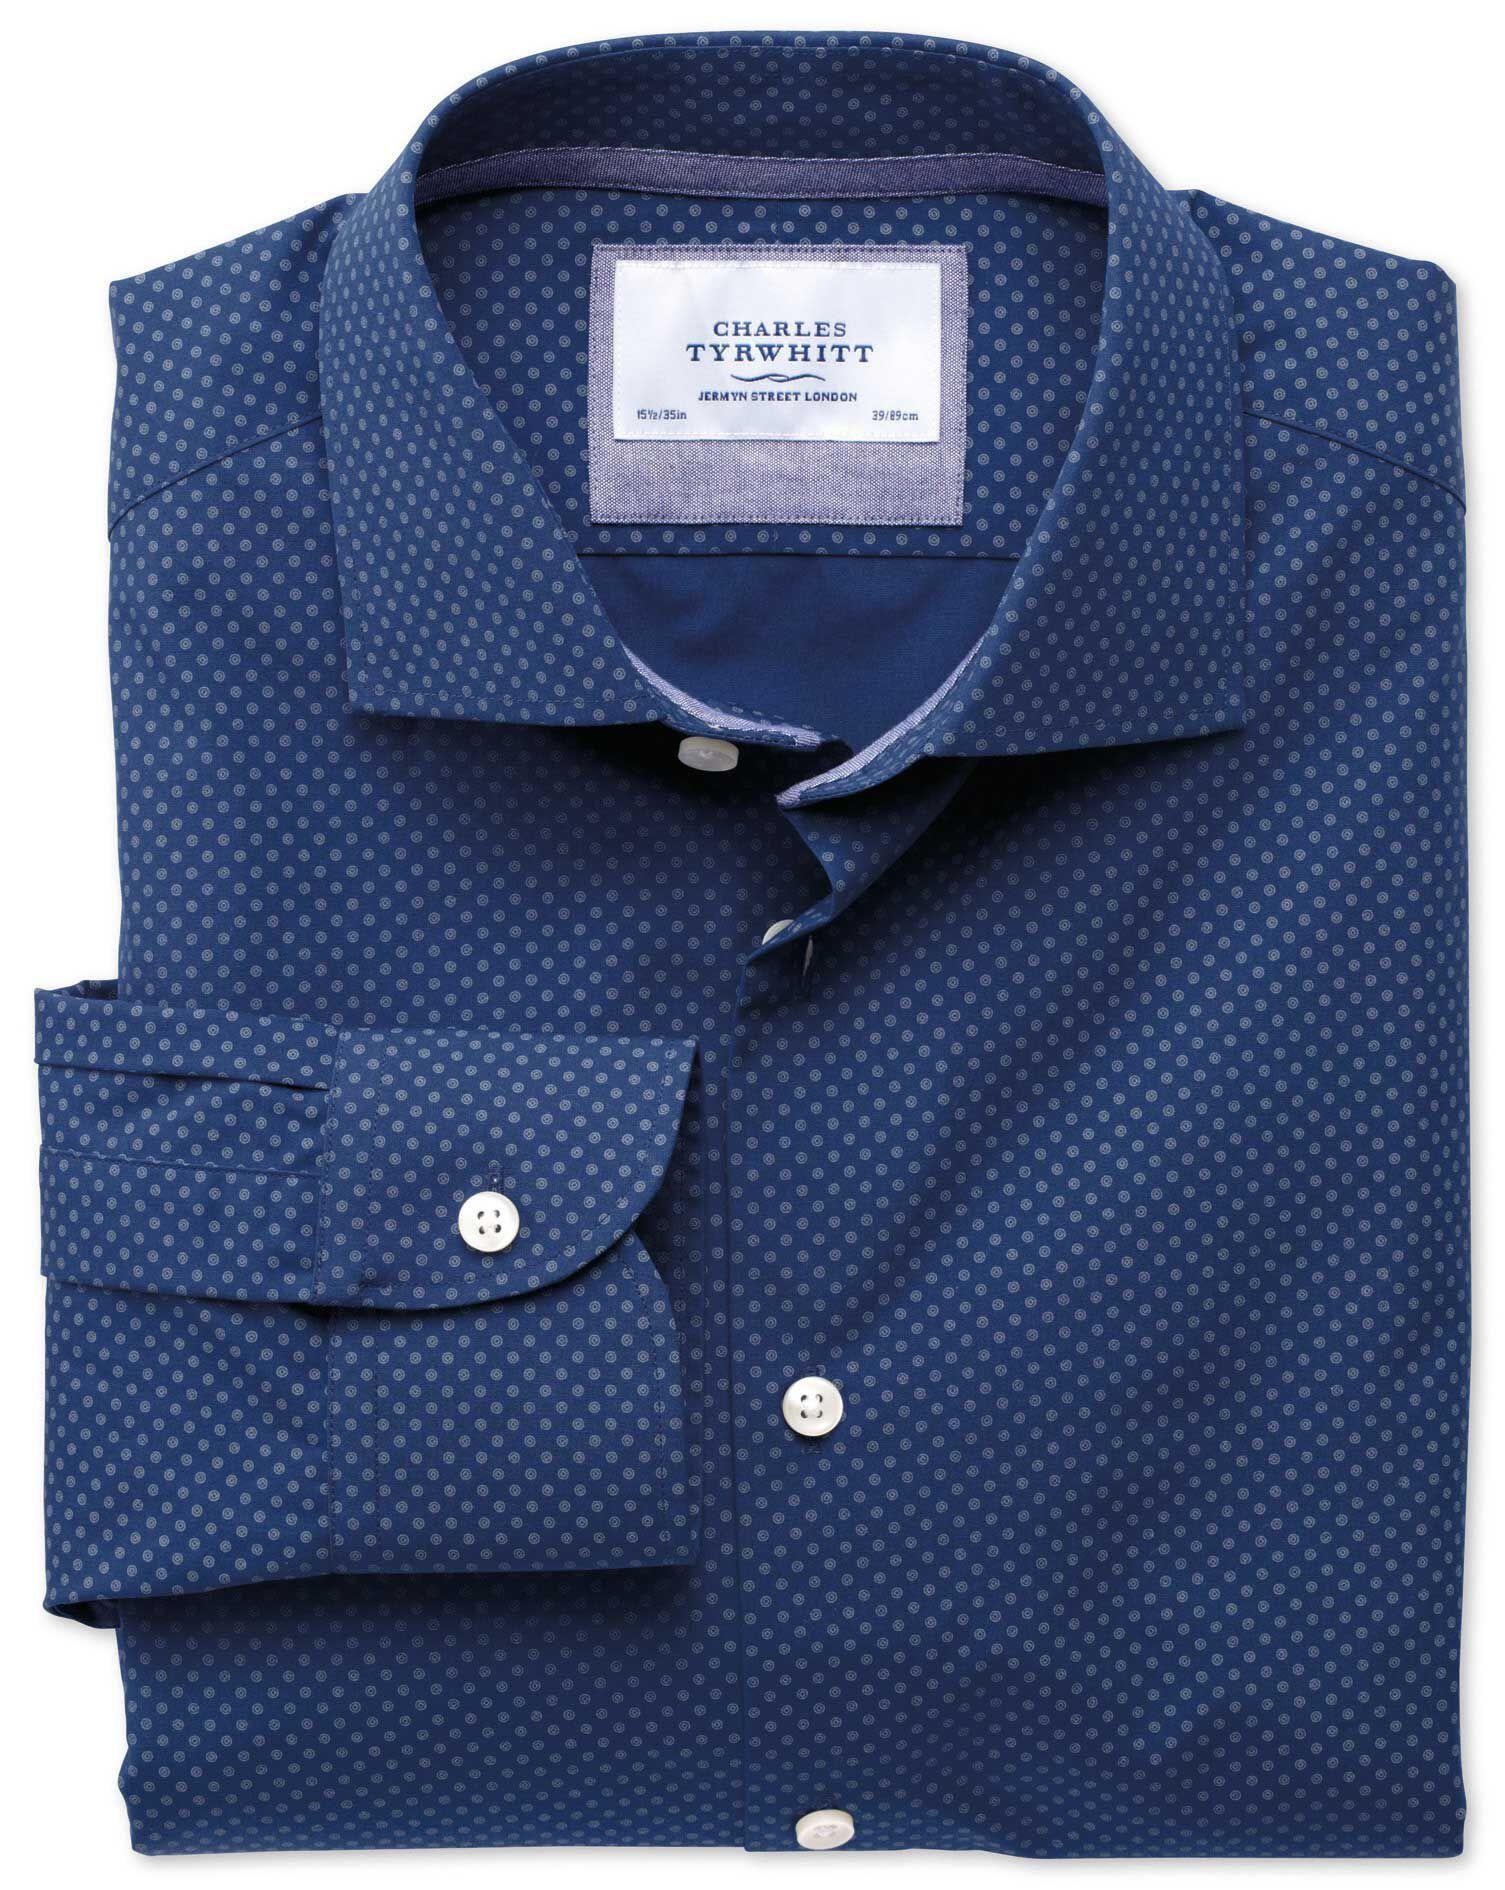 Extra Slim Fit Semi-Cutaway Collar Business Casual Printed Blue Cotton Formal Shirt Single Cuff Size